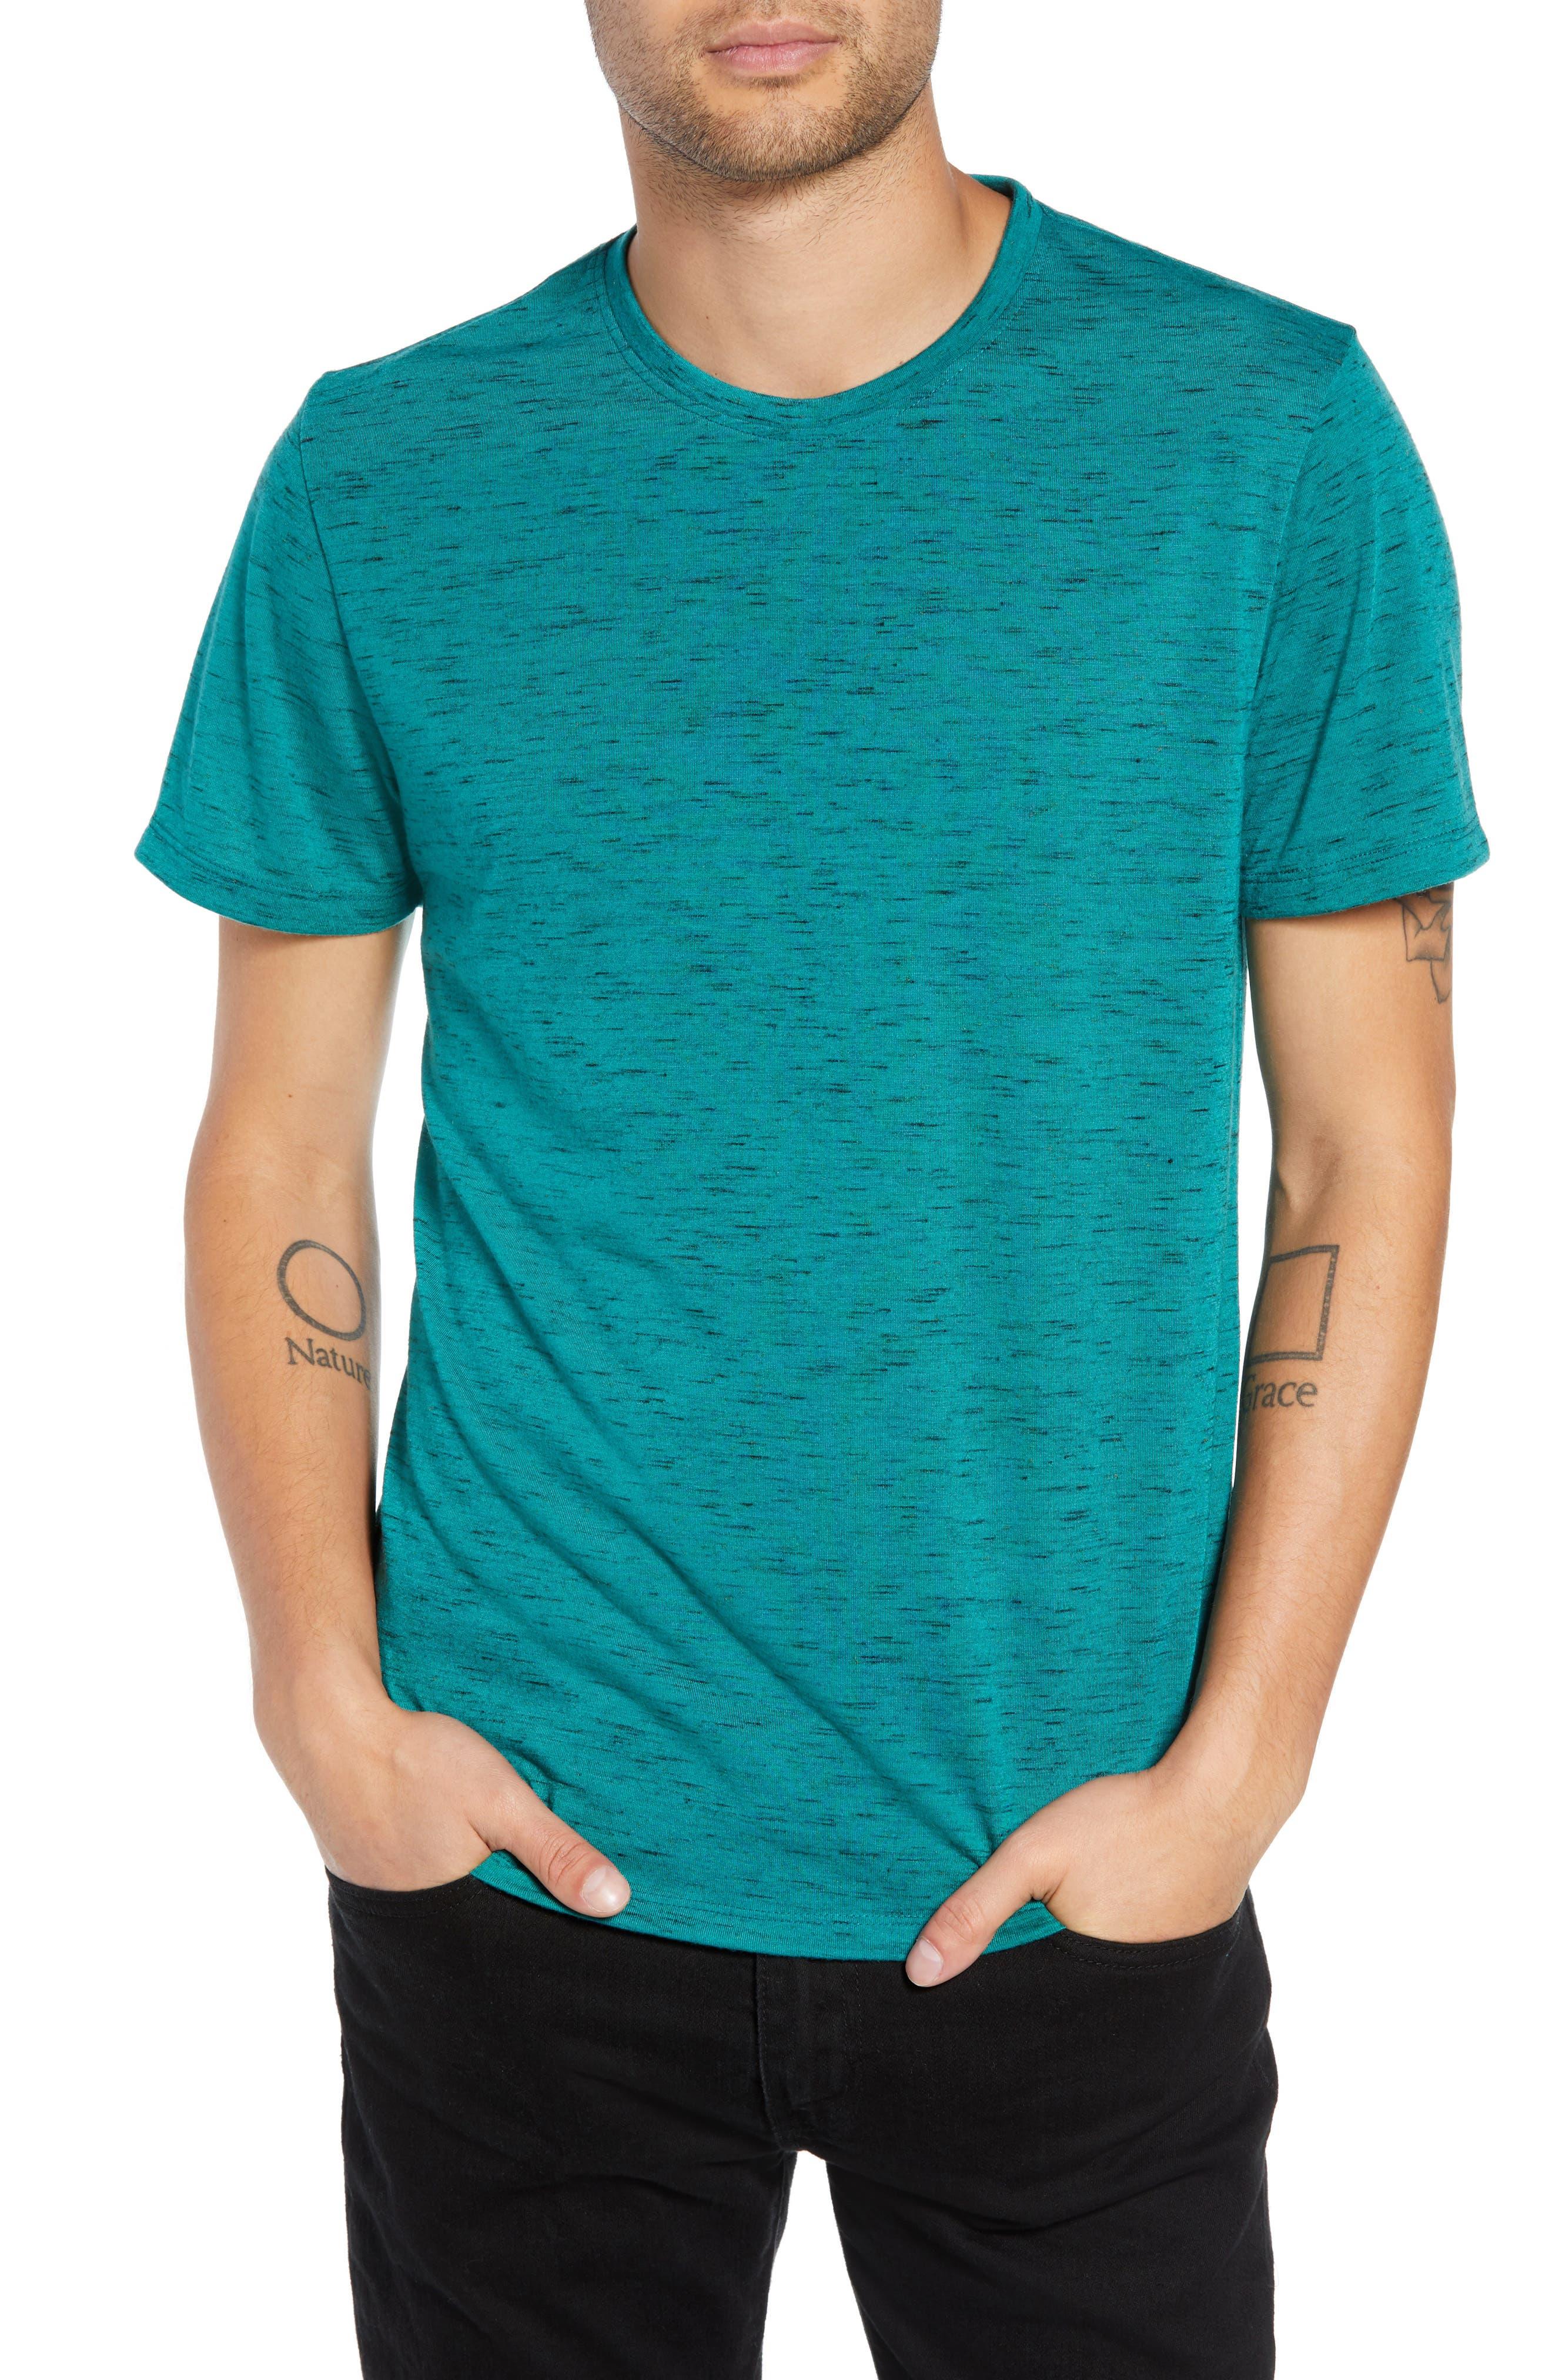 Streaky T-Shirt,                         Main,                         color, TEAL GREEN- BLACK